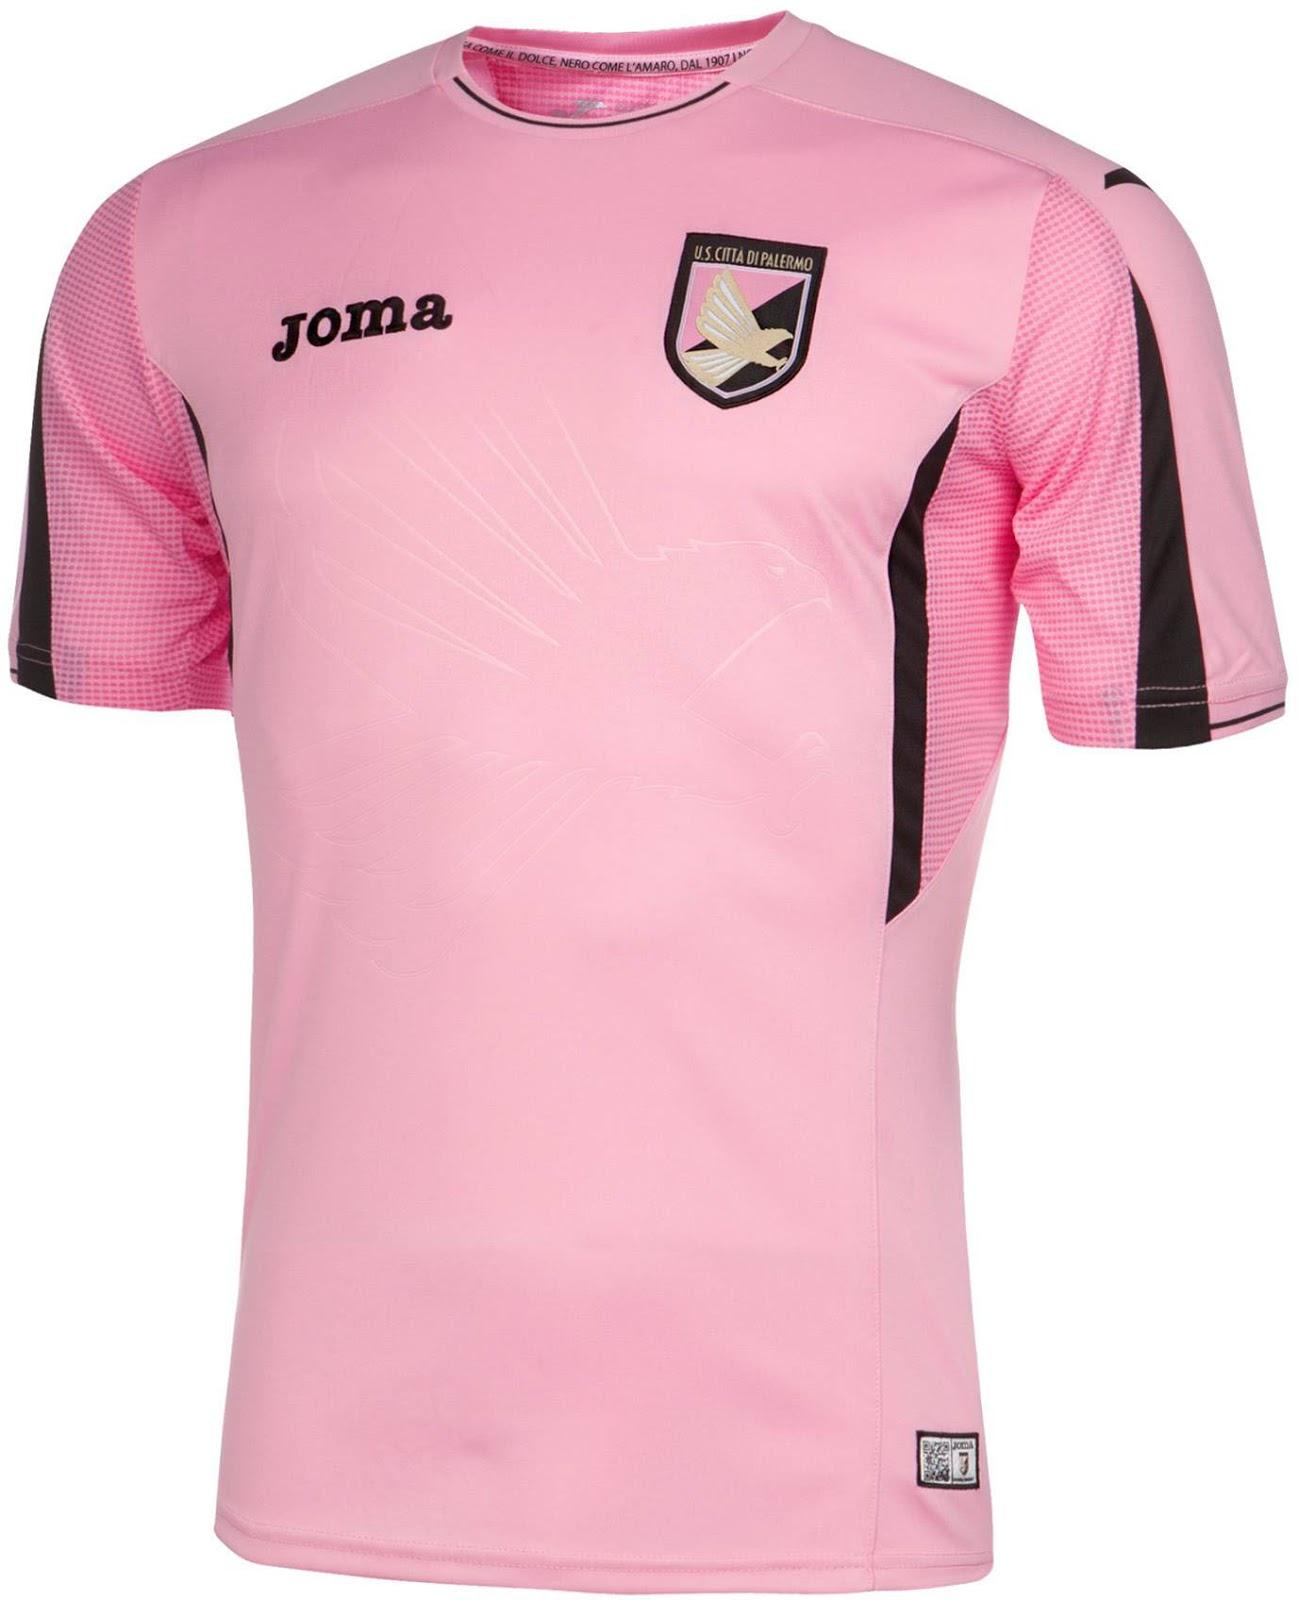 palermo 15 16 home shirt - Pink Home 2015